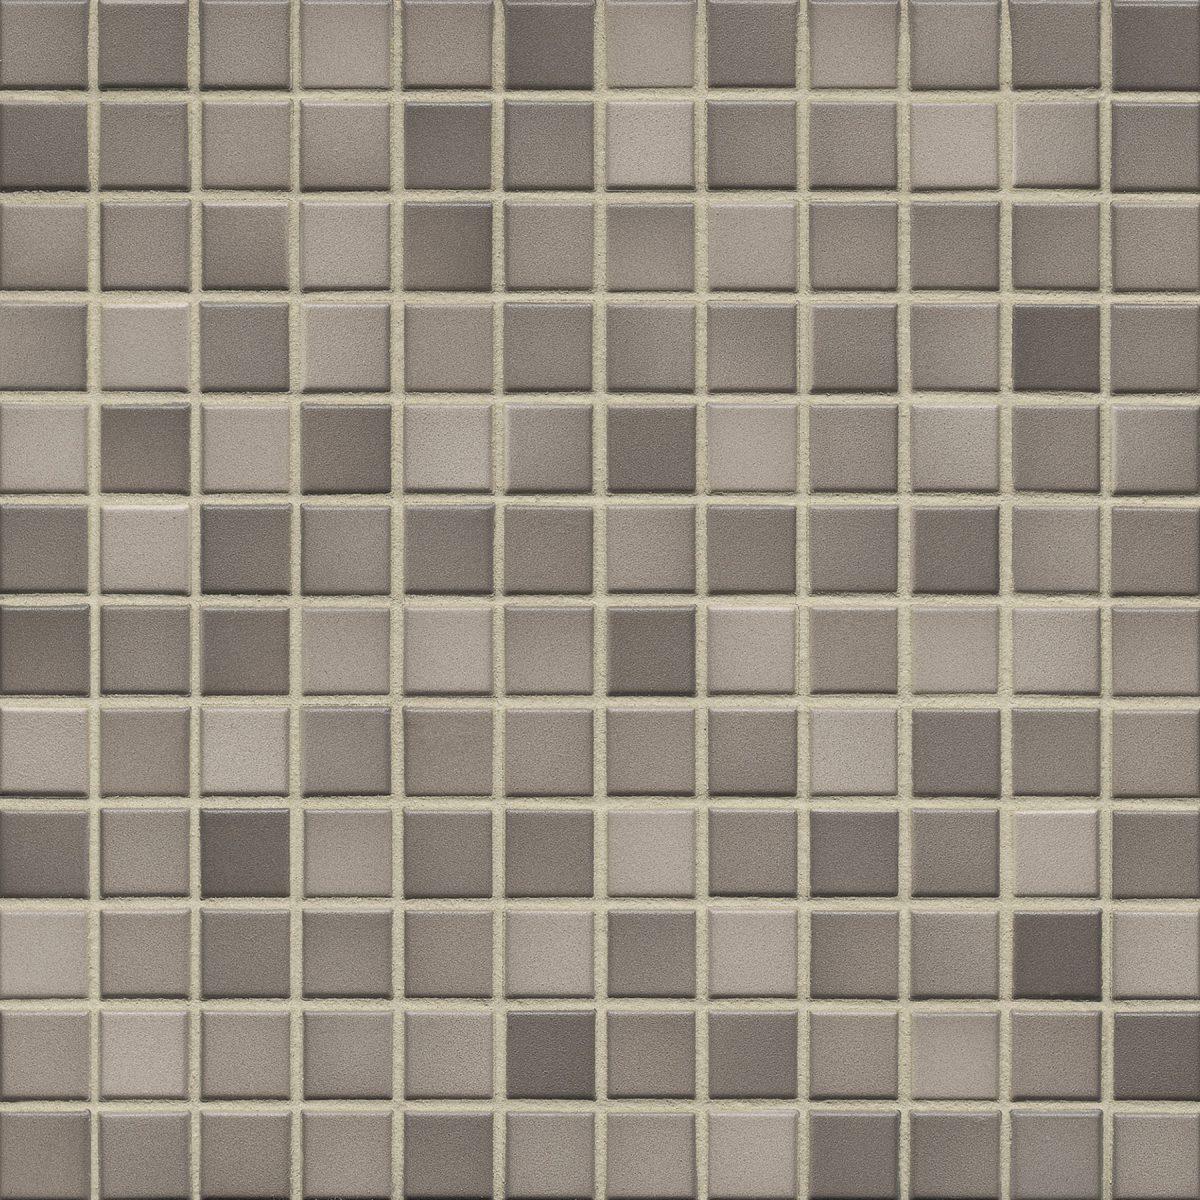 Мозаика серия Fresh 2,4 X 2,4 см Taupe Mix Secura (противоскользящая R10/B)